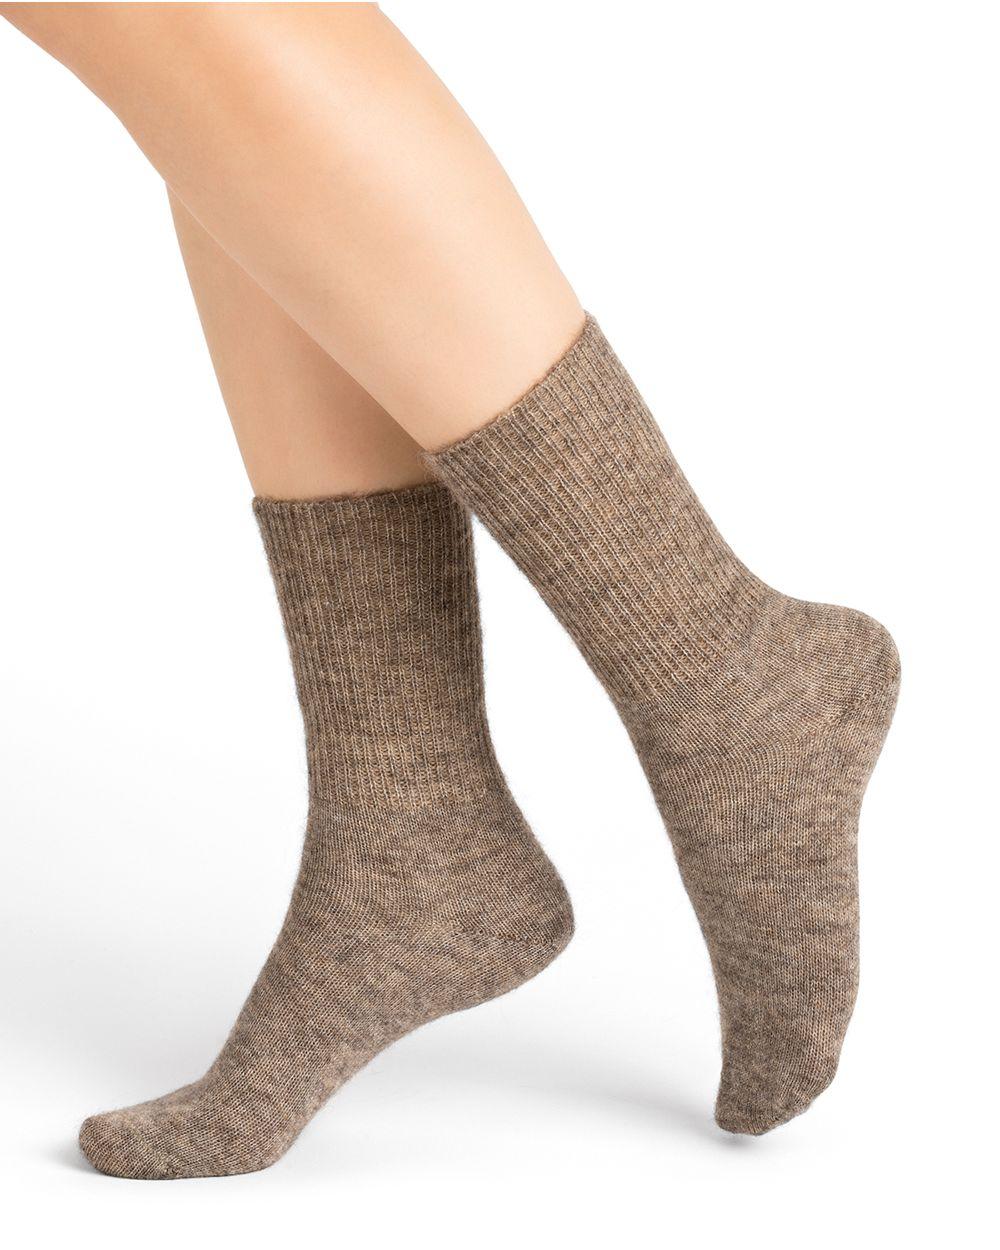 bleforet chaussettes-alpaga